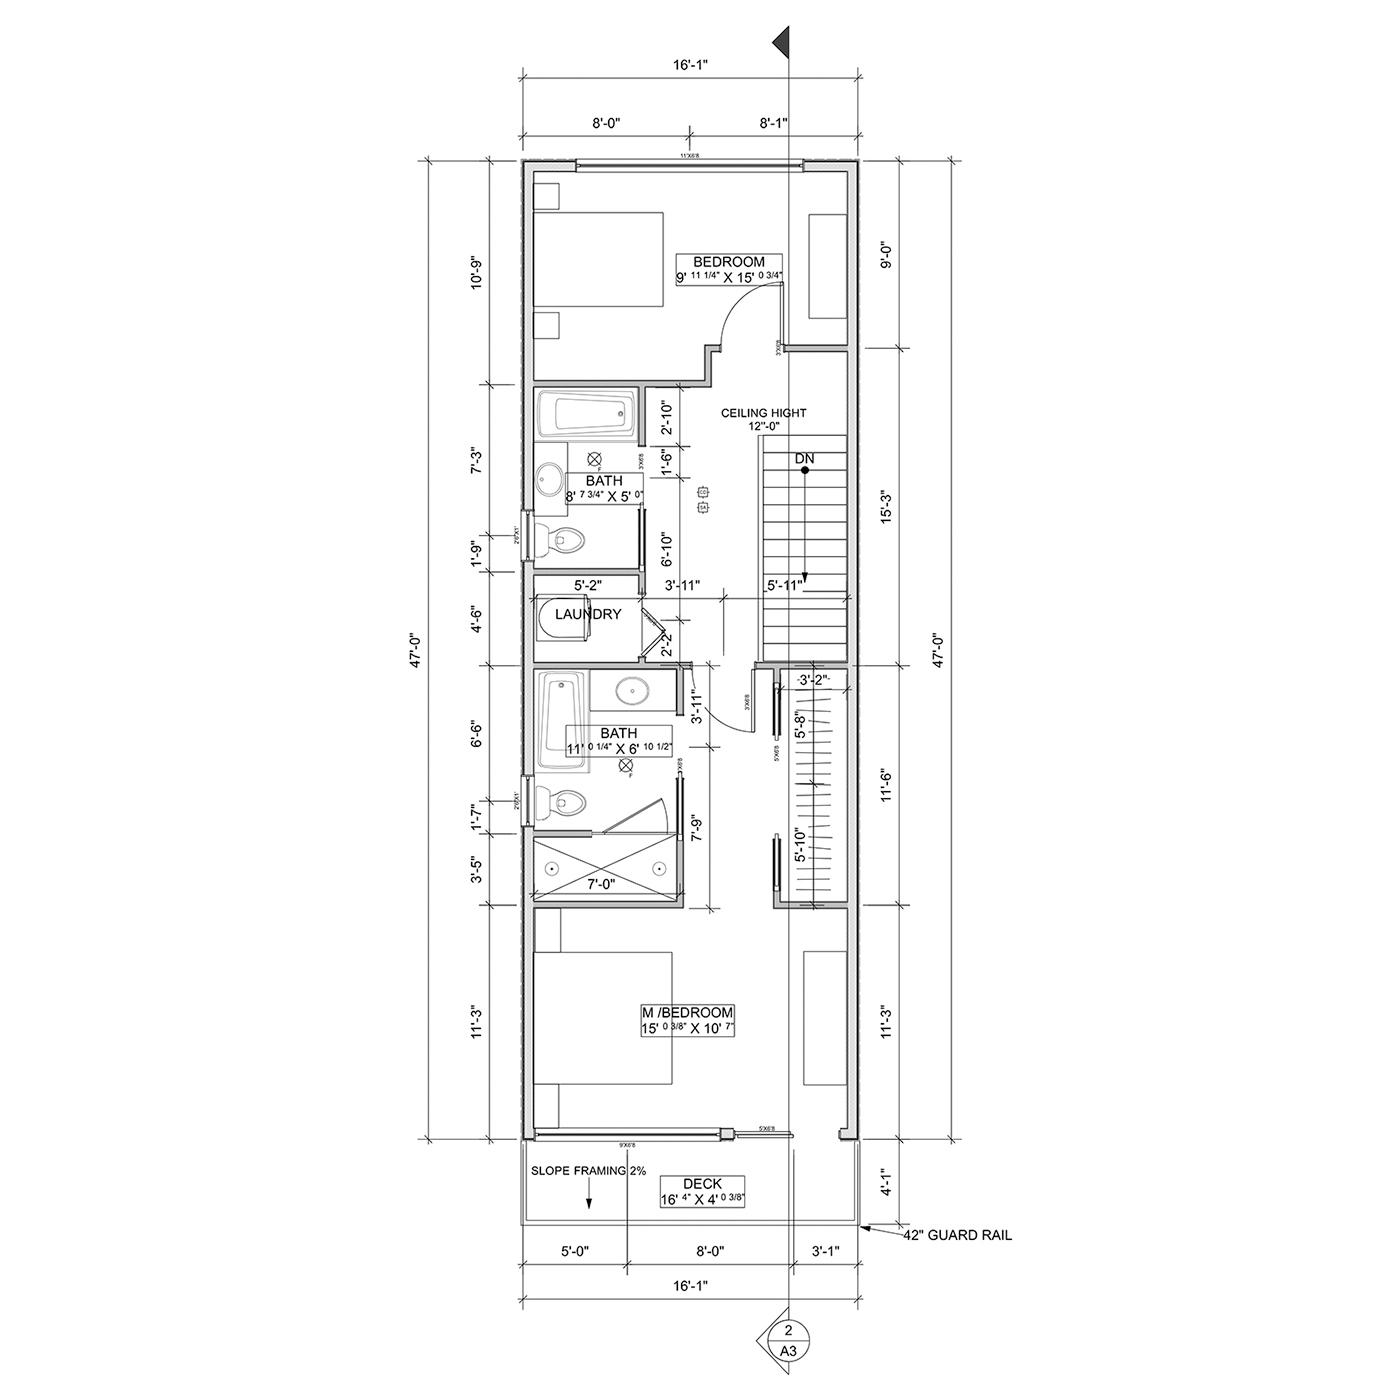 Floor plans new construction design one stevens for New home construction floor plans